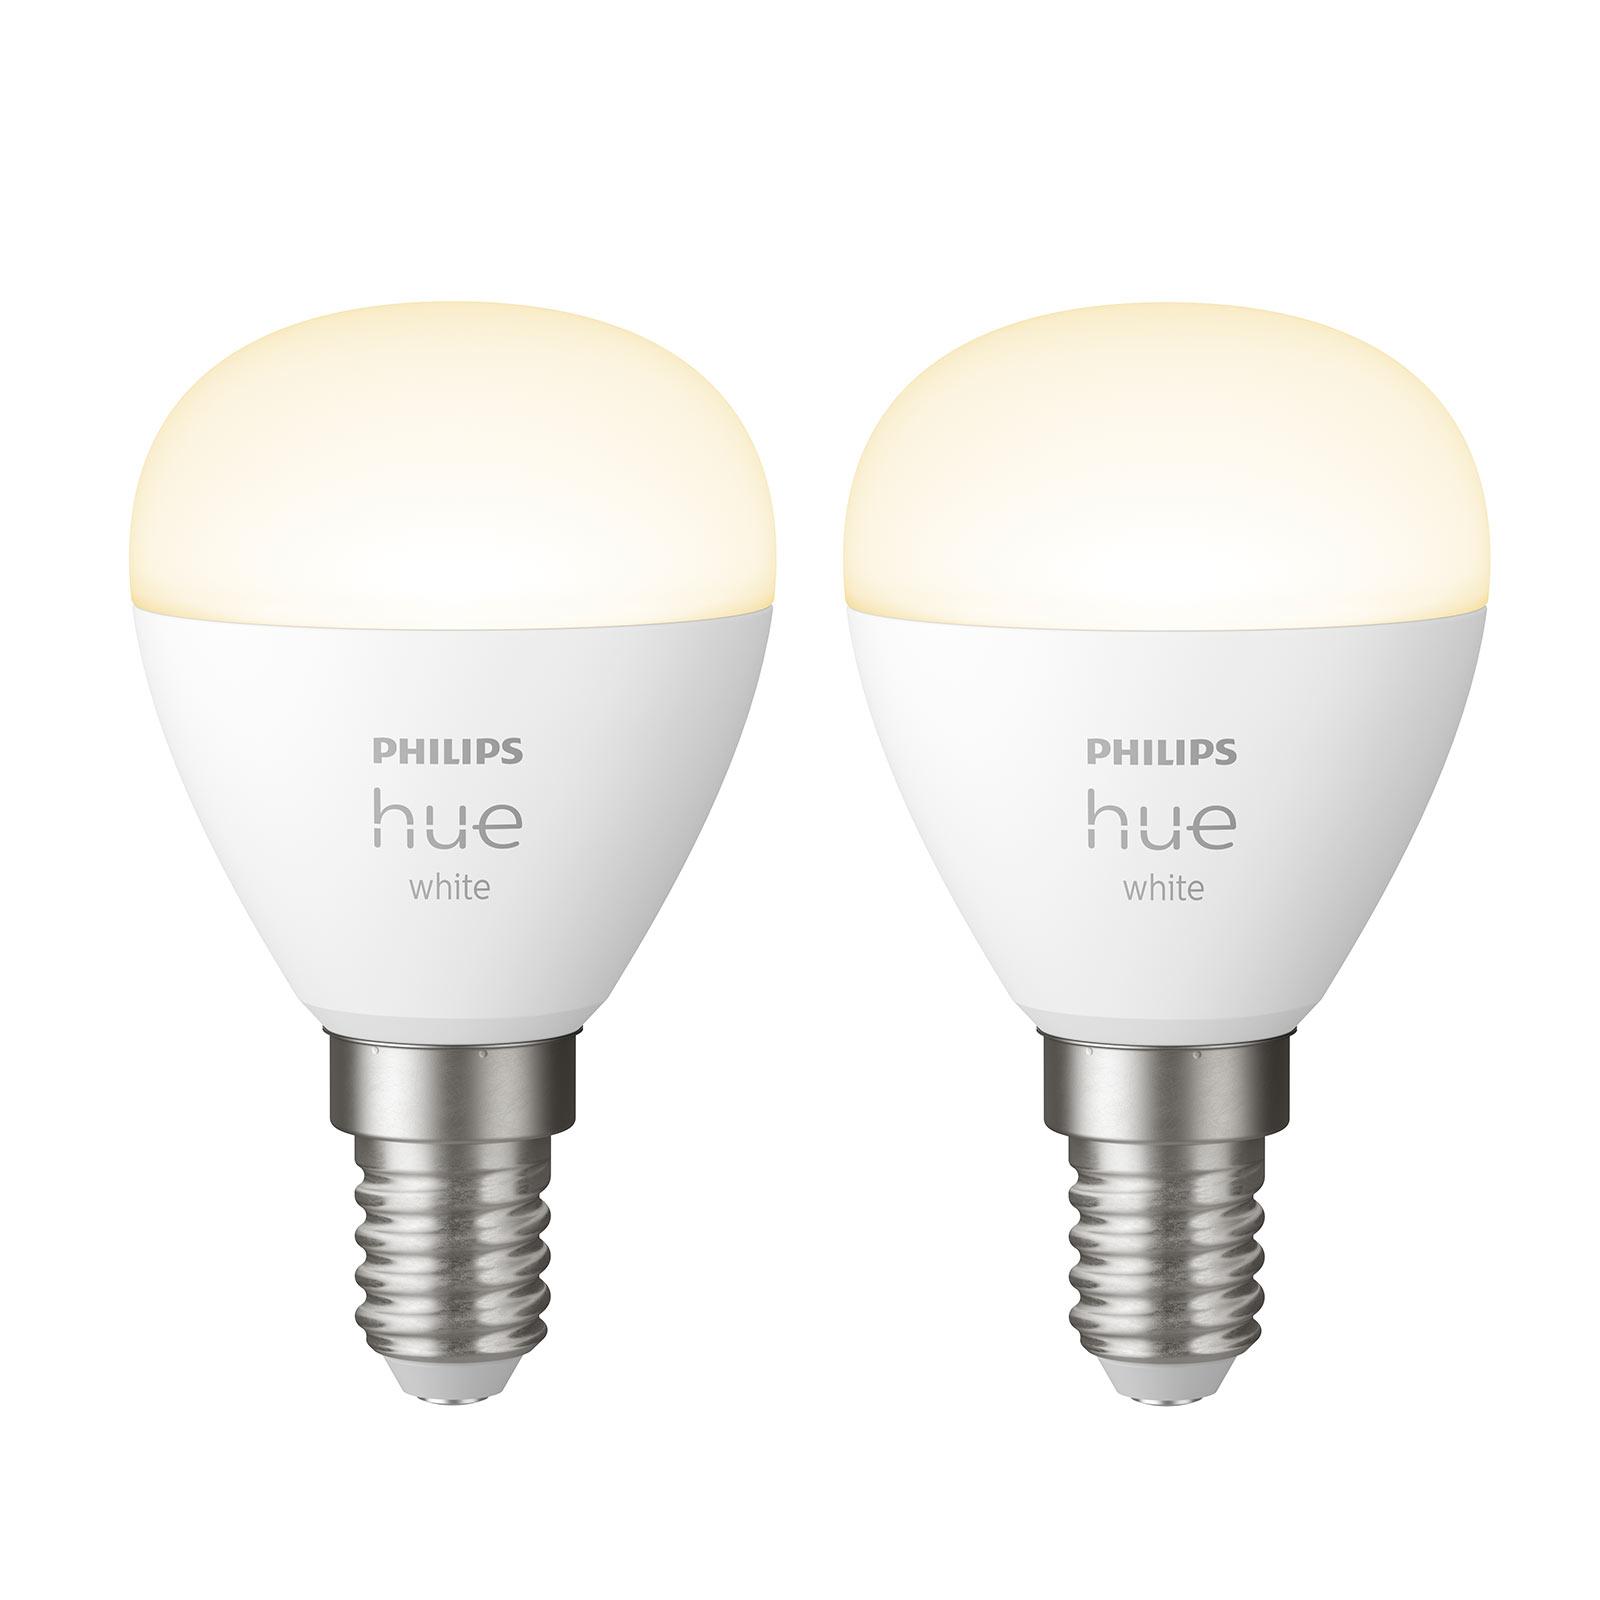 Philips Hue White LED-Tropfenlampe 2 x E14 5,7W